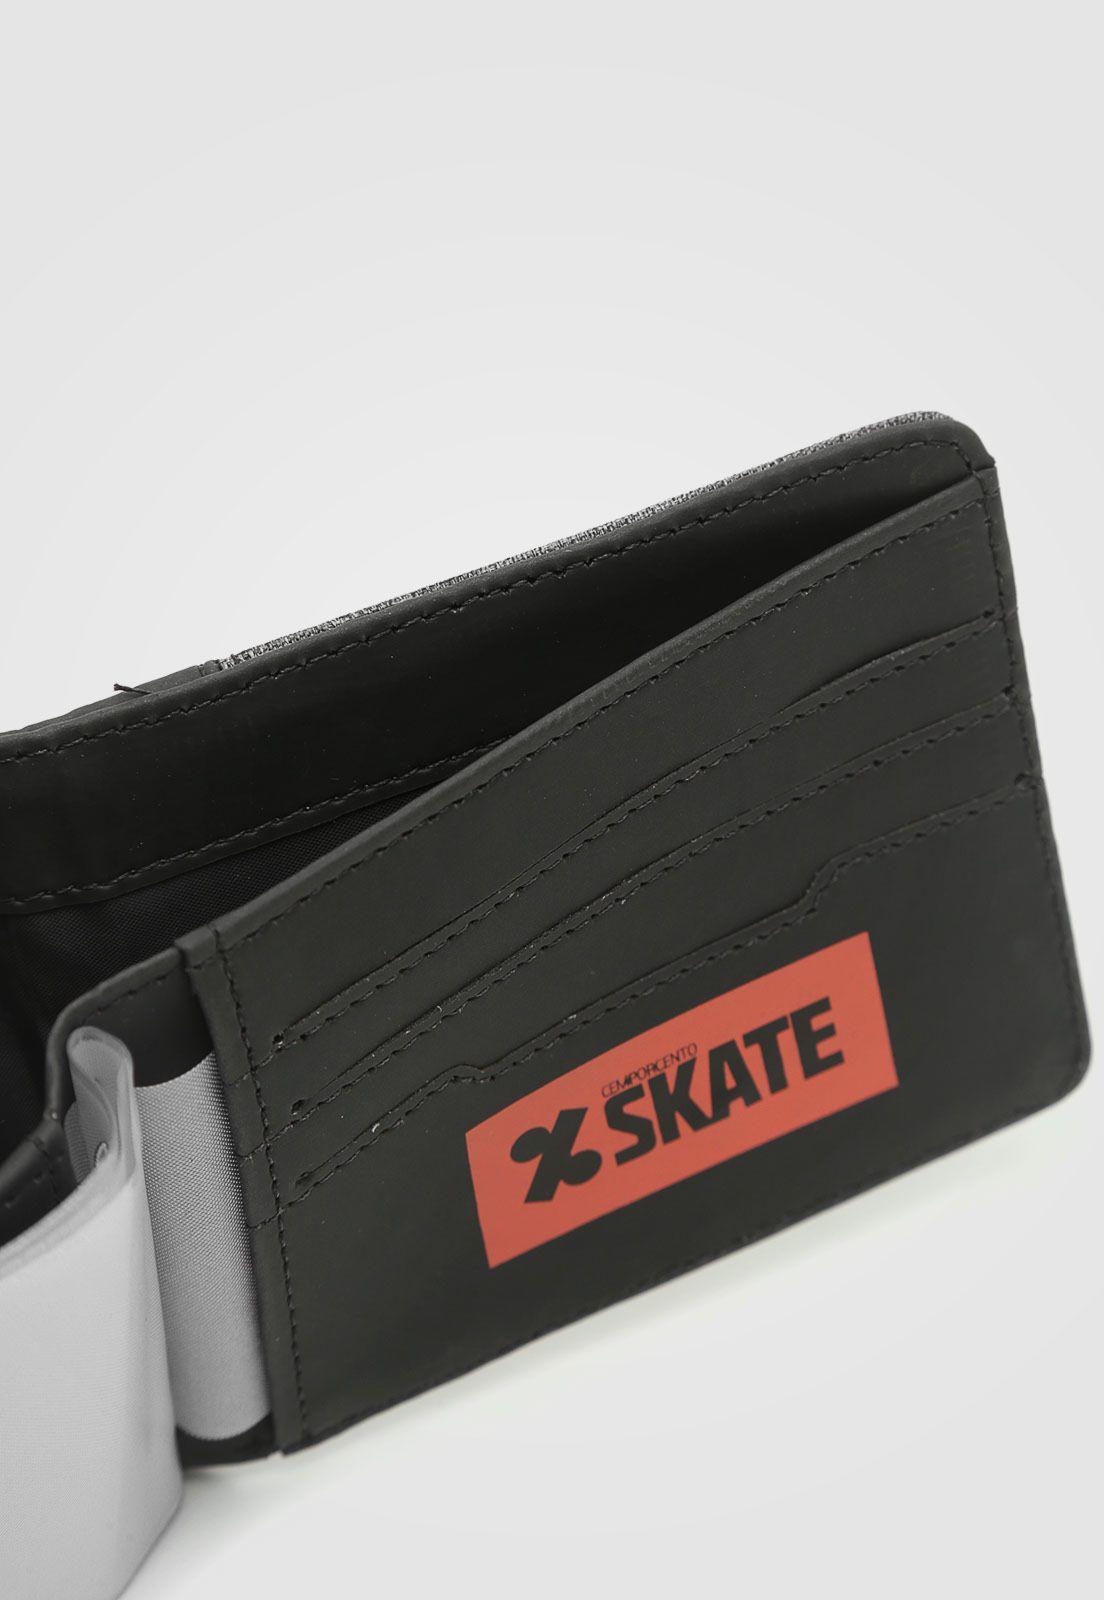 Carteira Starter Collab 100% Skate